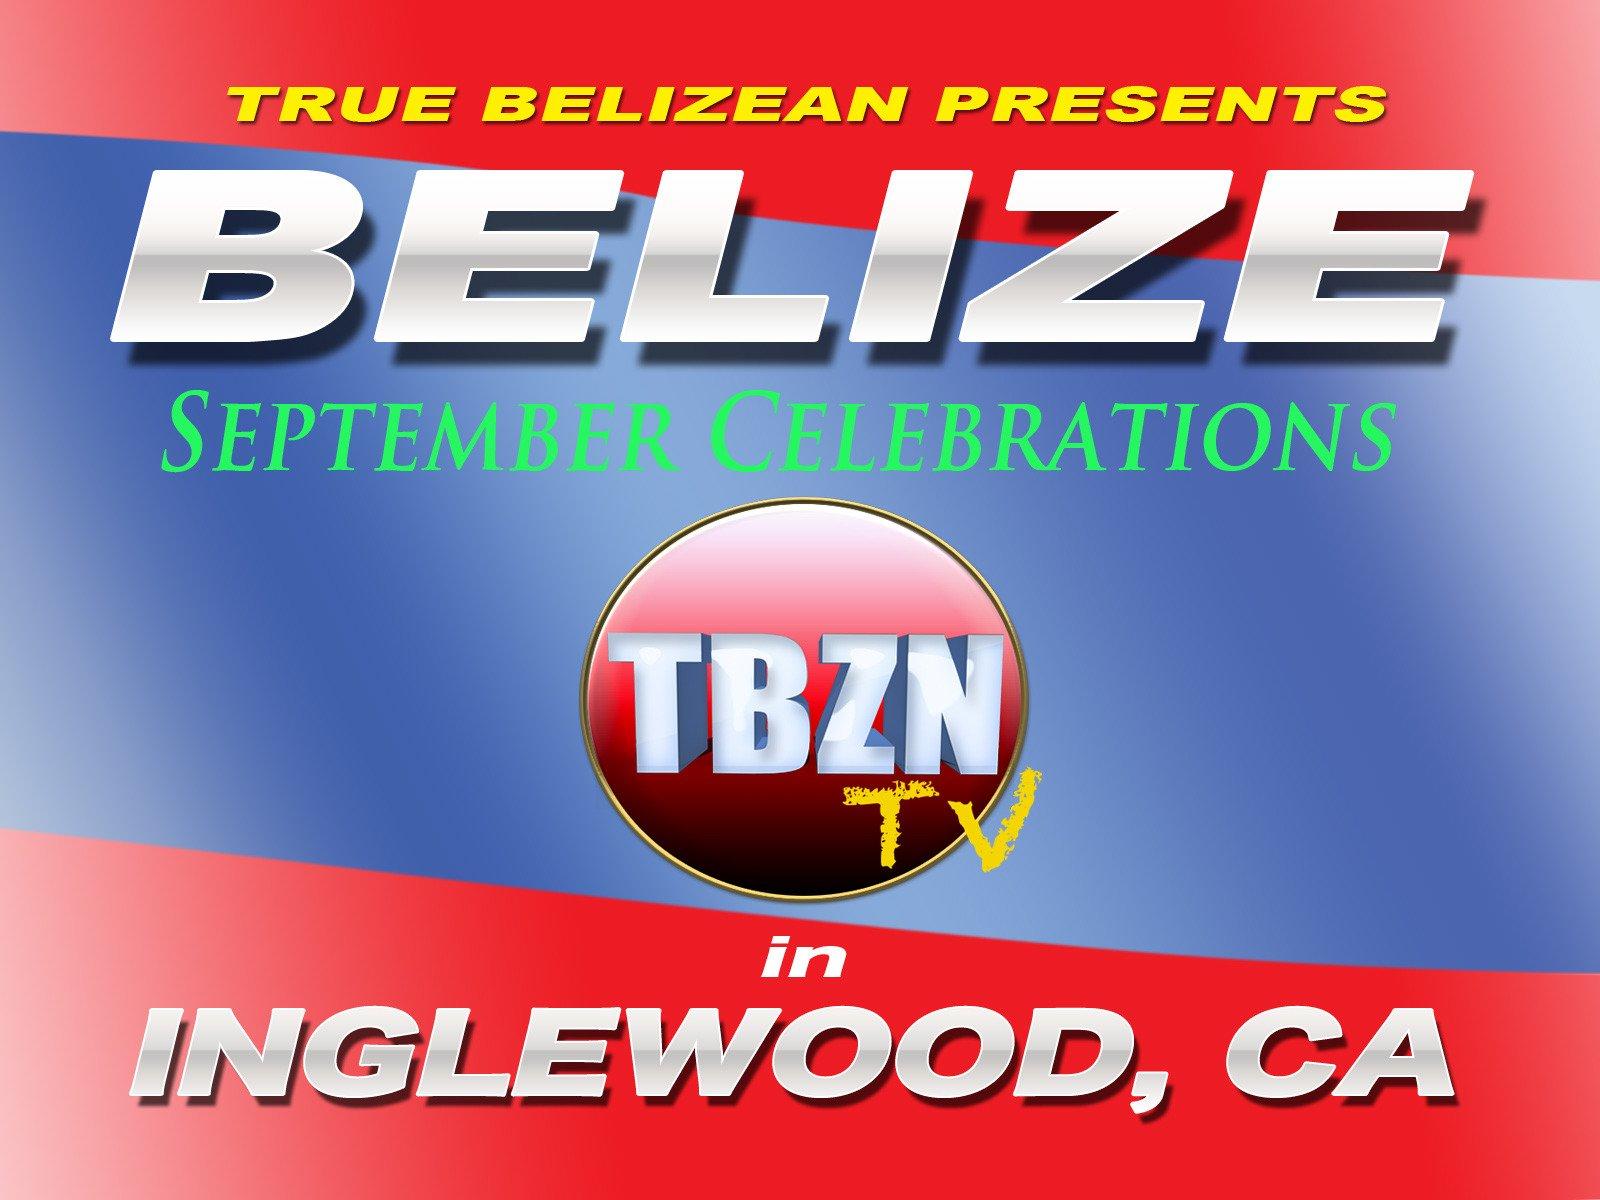 Belize September Celebrations in Inglewood Ca - Season 2017